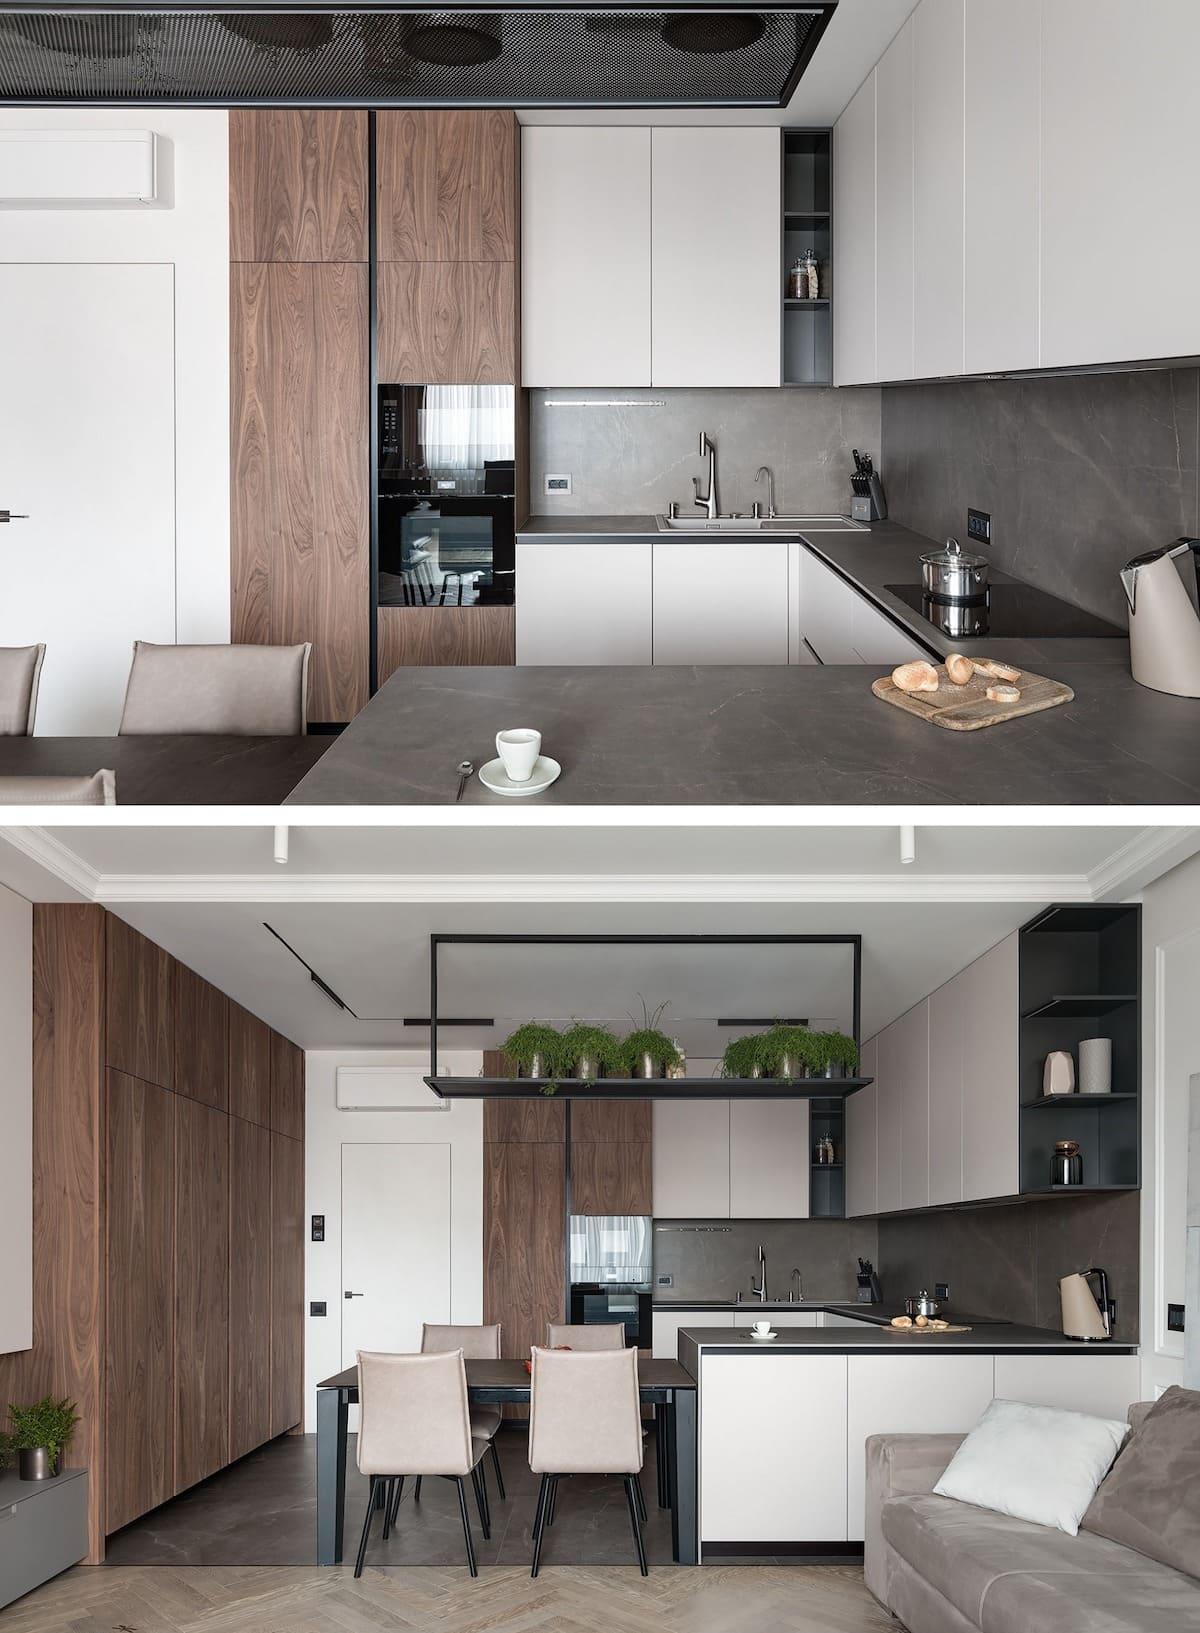 дизайн интерьера модной квартиры фото 54